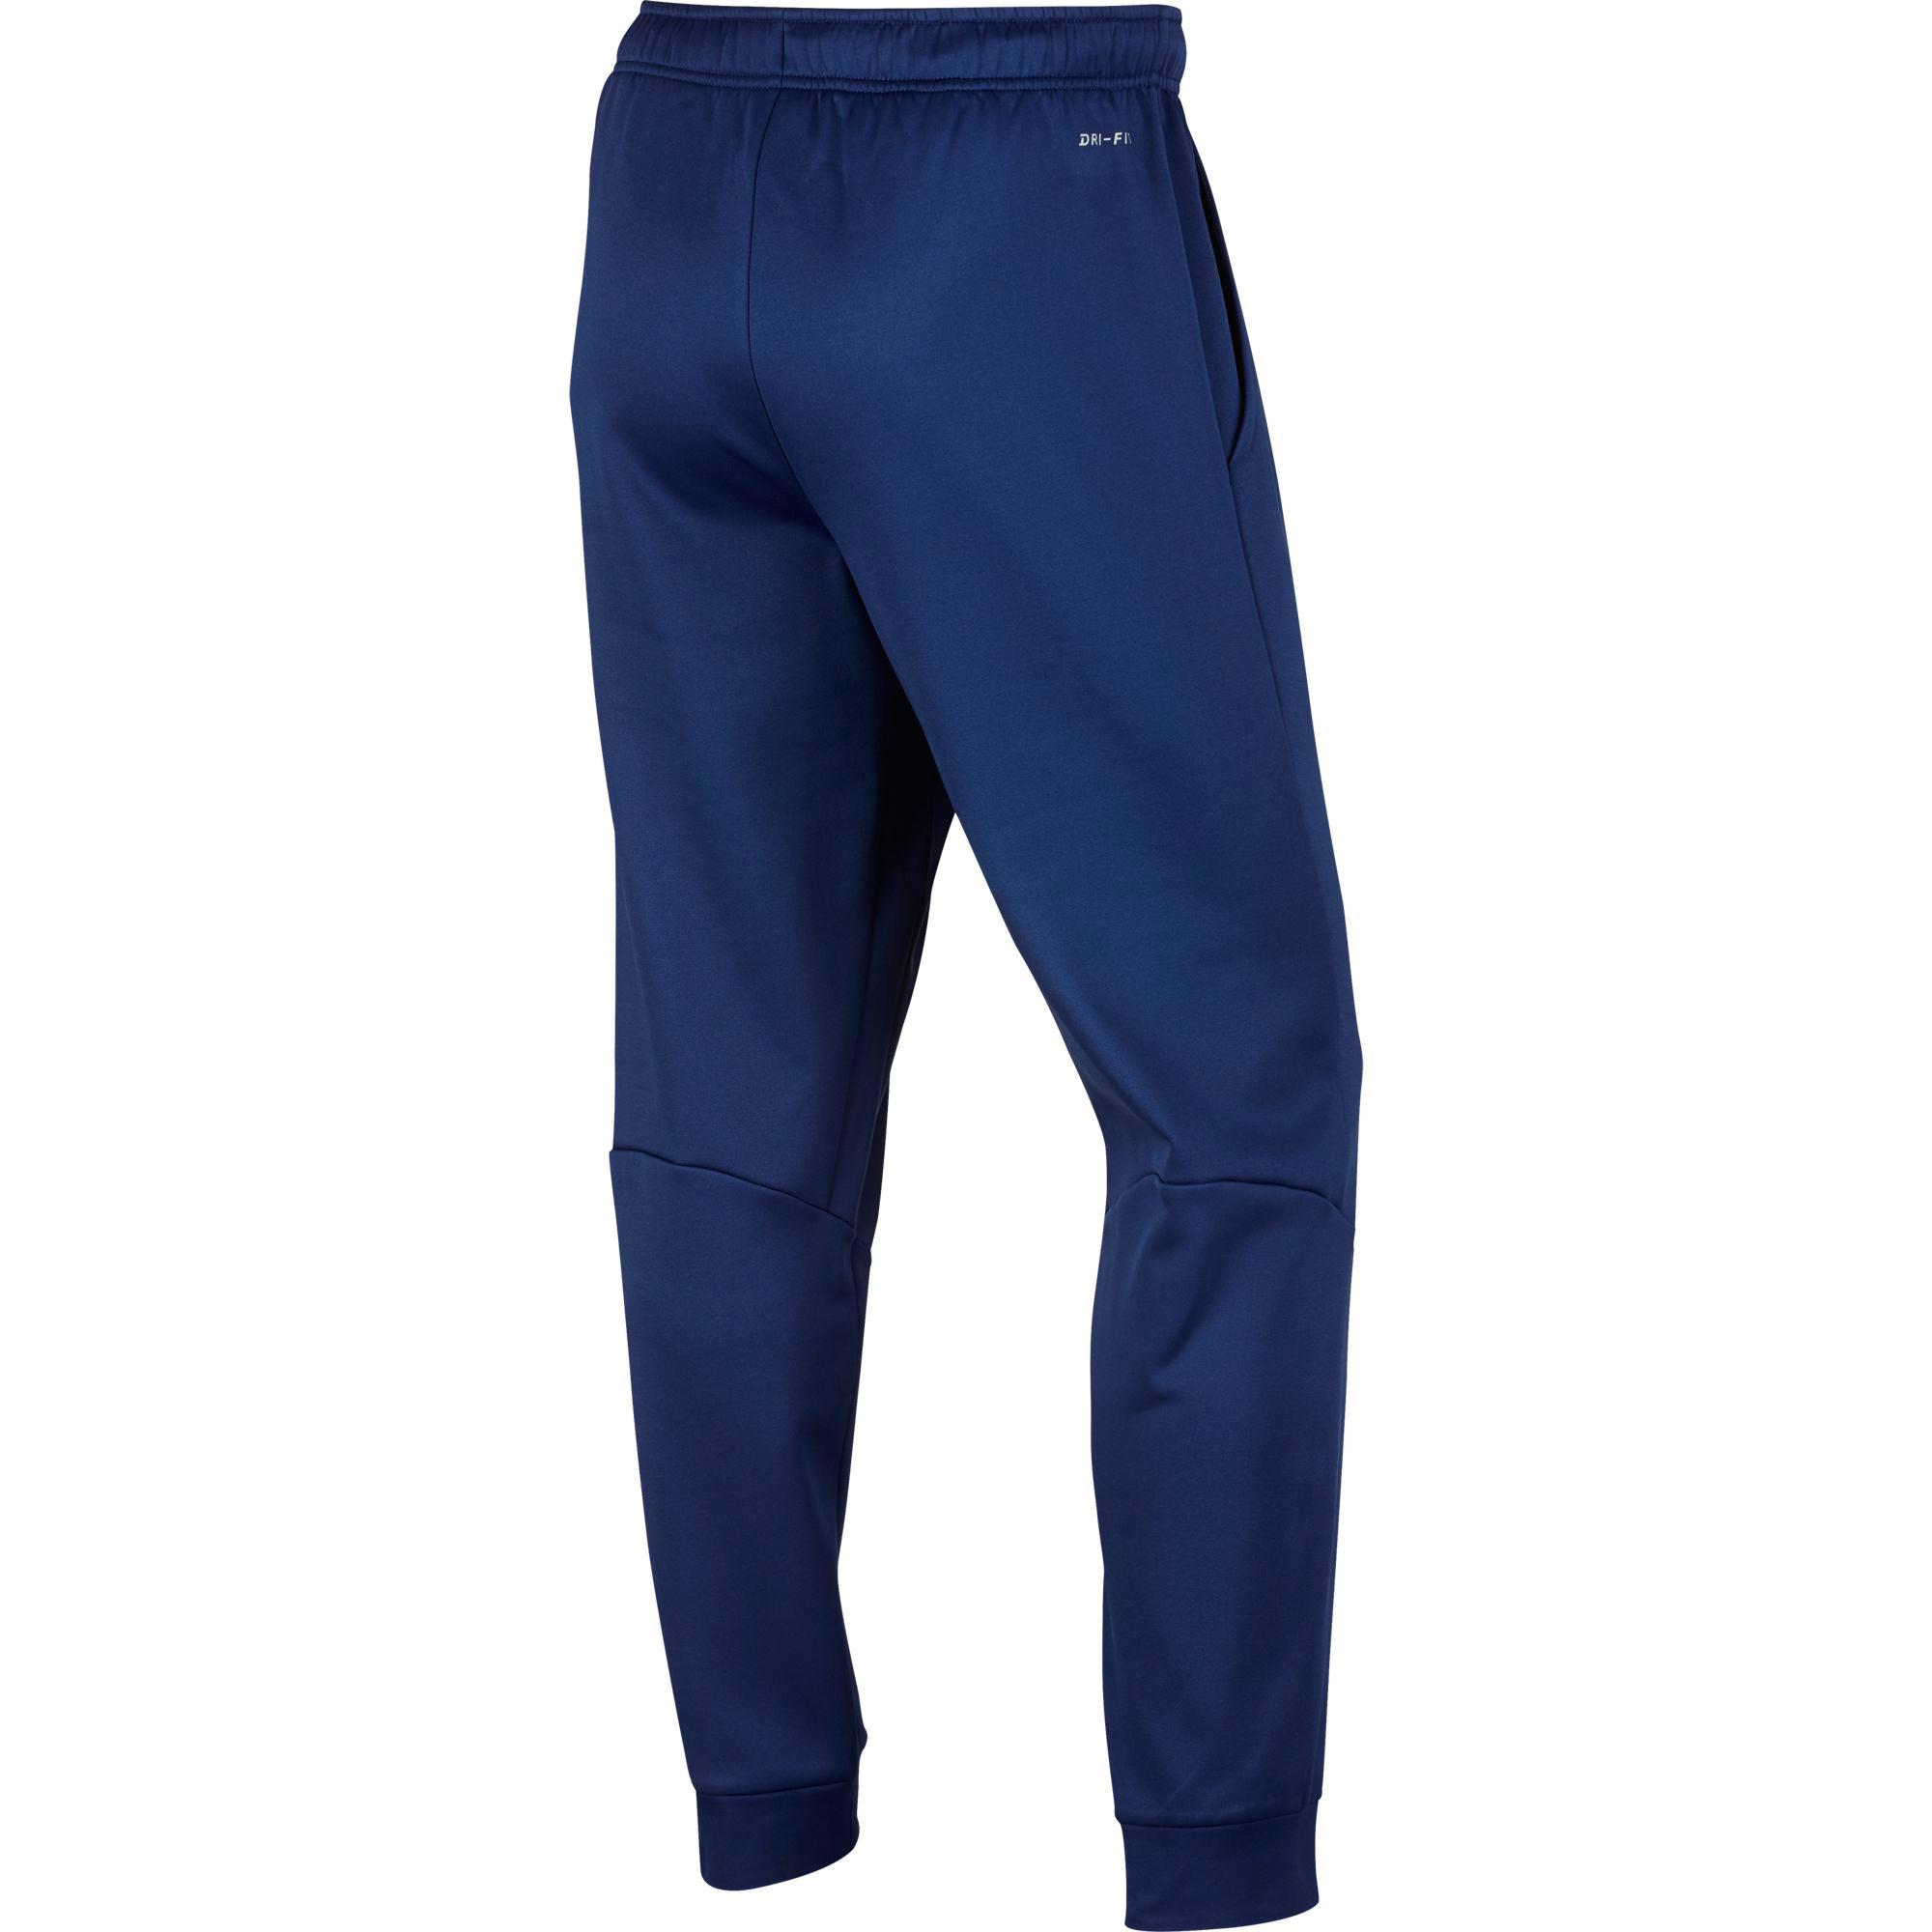 25f0b9779905 Nike Mens Therma Training Pants - Blue - Tennisnuts.com